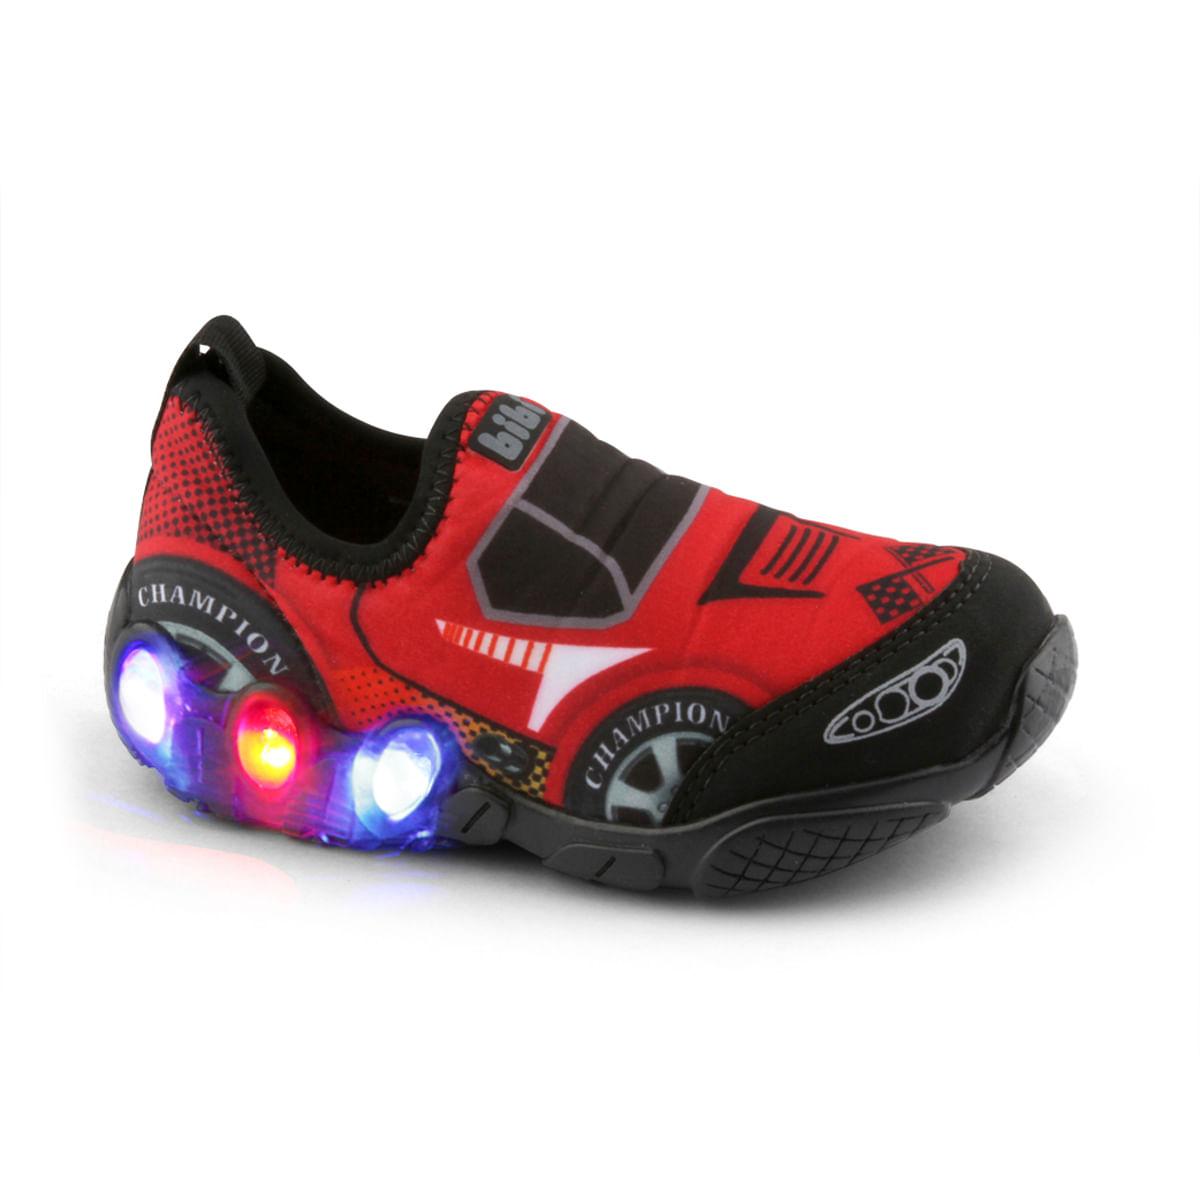 630a81fa81 Tênis Infantil Bibi Masculino de Luz Vermelho Space Wave 545151 ...